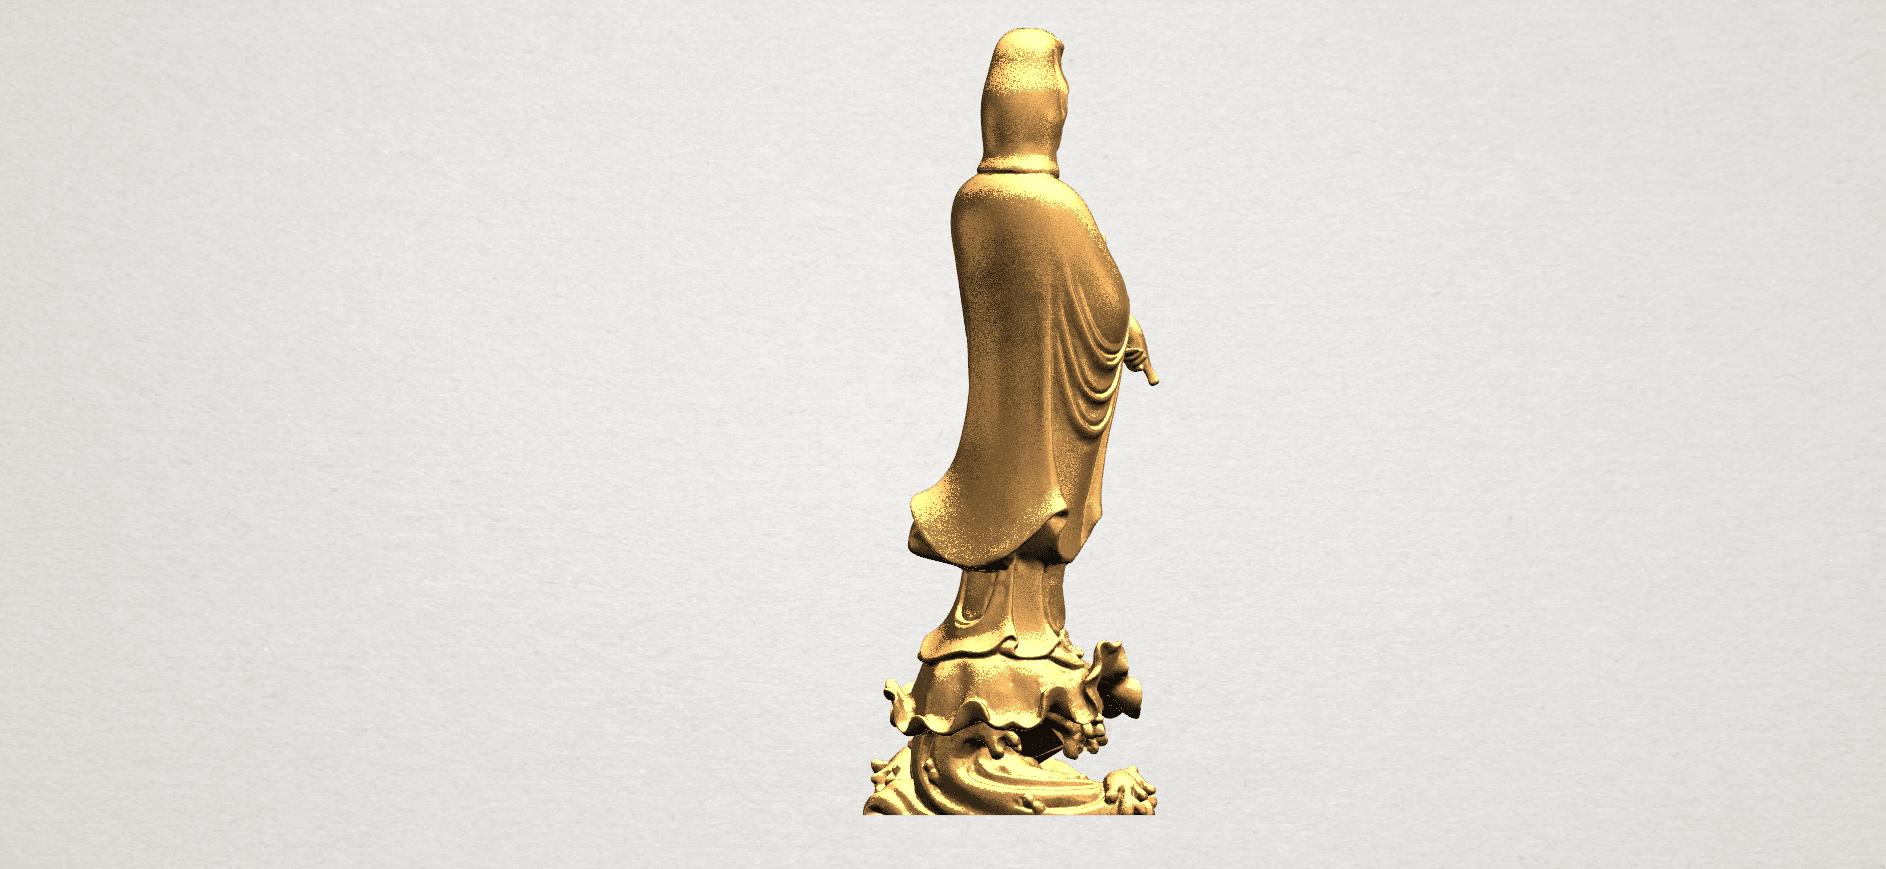 Avalokitesvara Buddha - Standing (v) A07.png Download free STL file Avalokitesvara Buddha - Standing 05 • 3D printer template, GeorgesNikkei